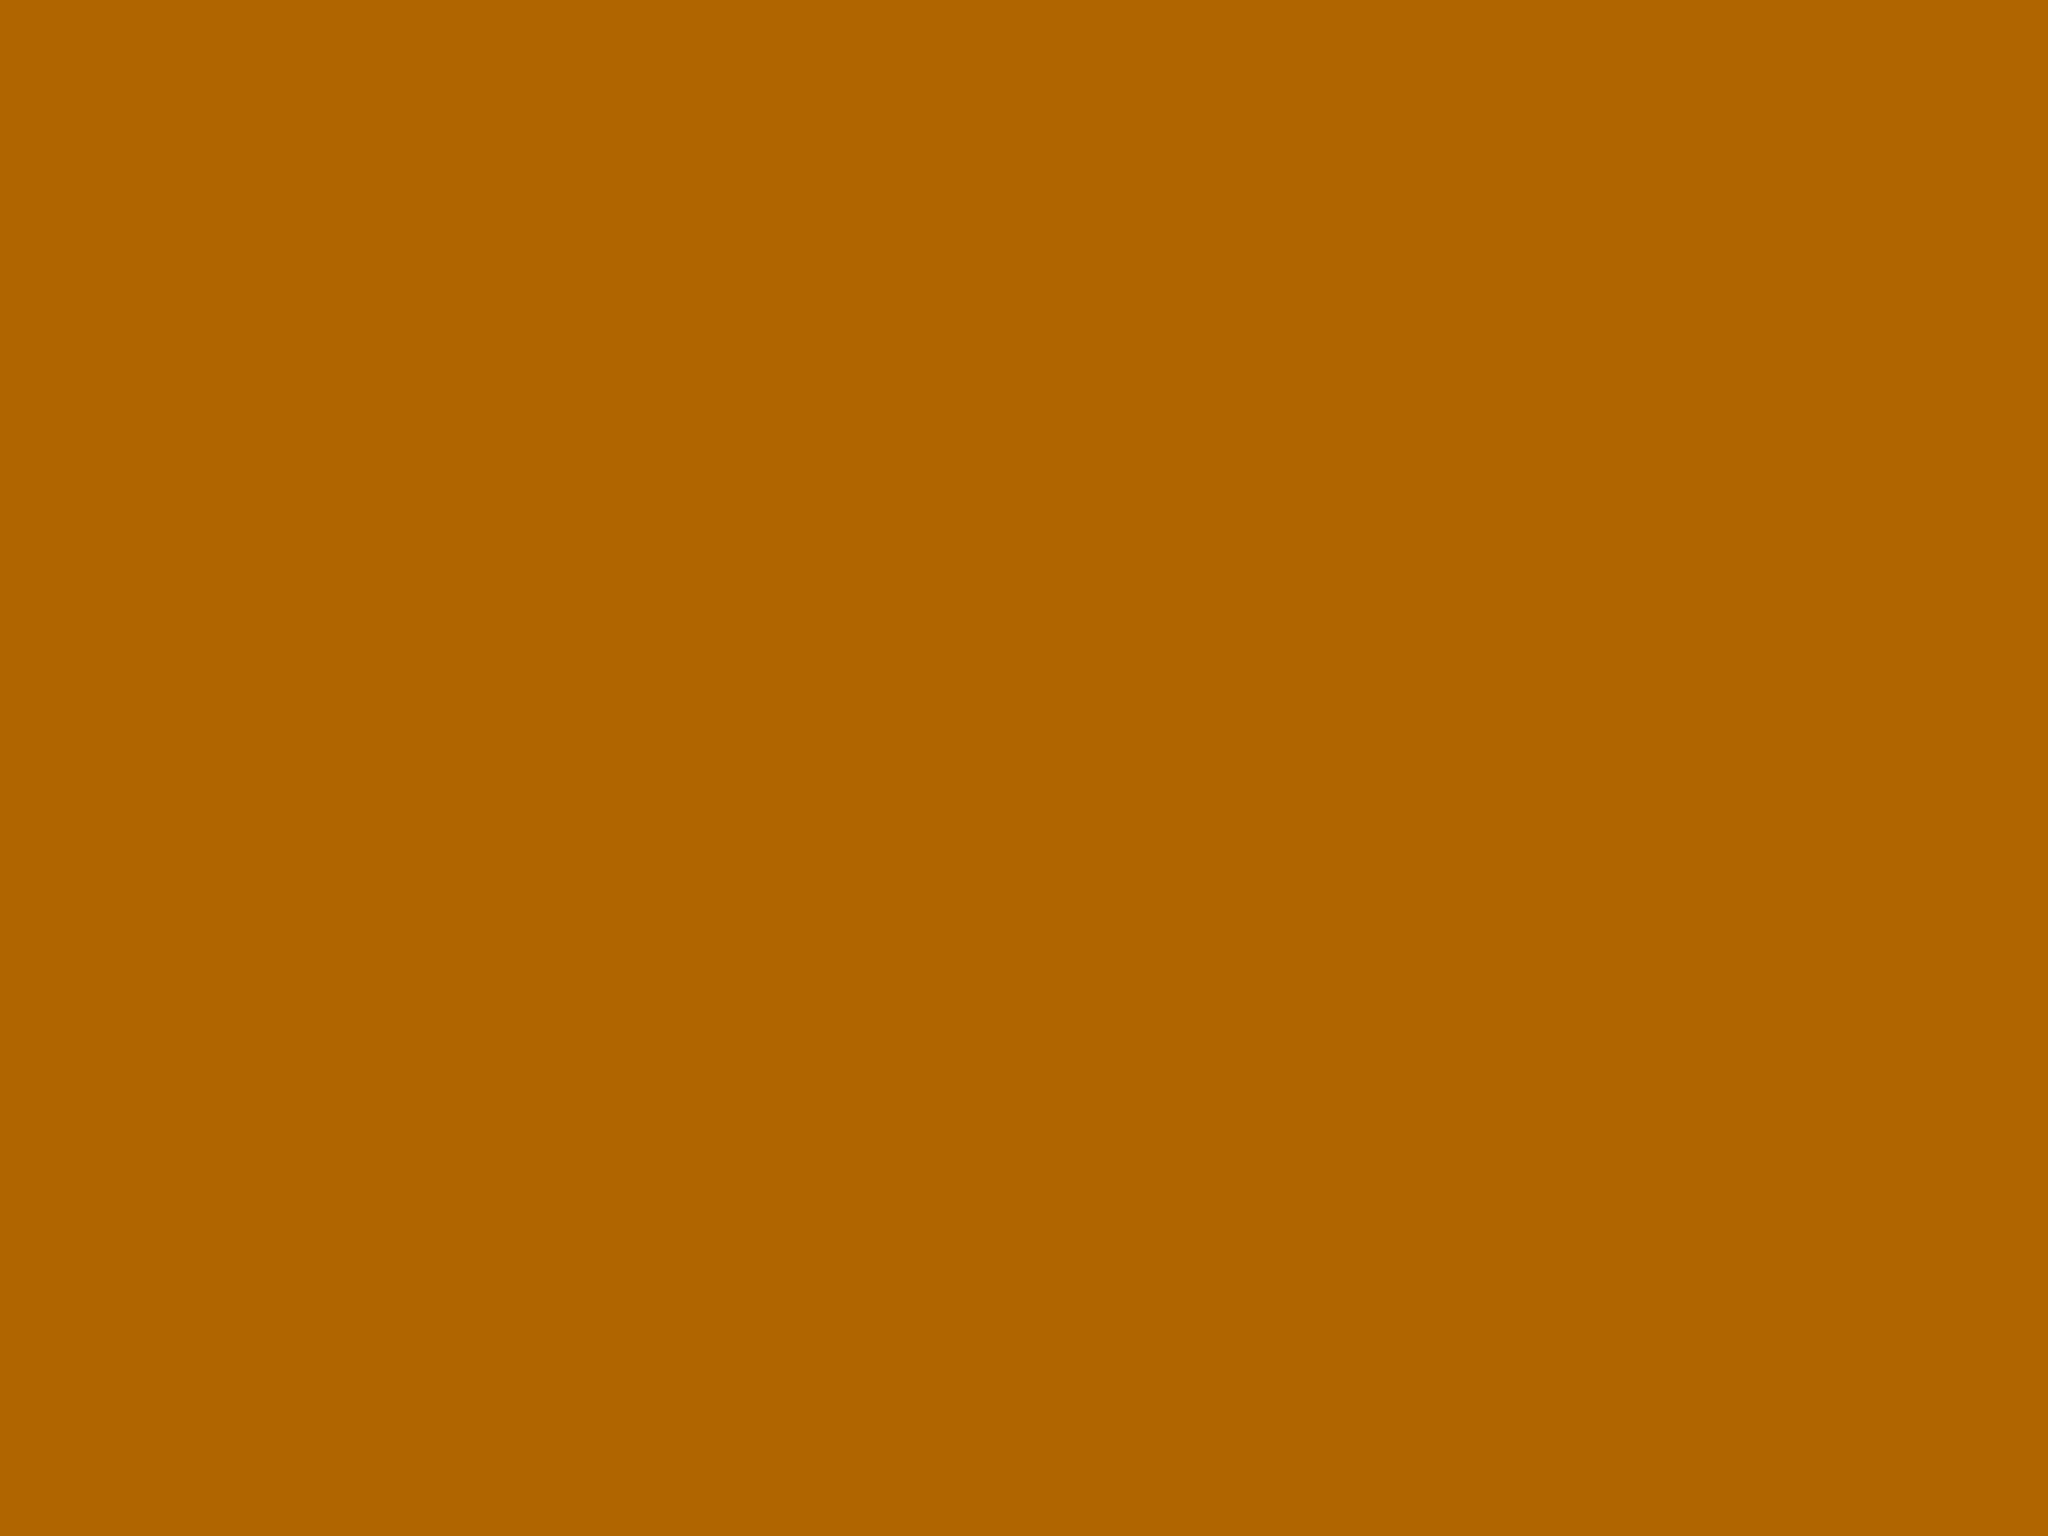 2048x1536 Ginger Solid Color Background